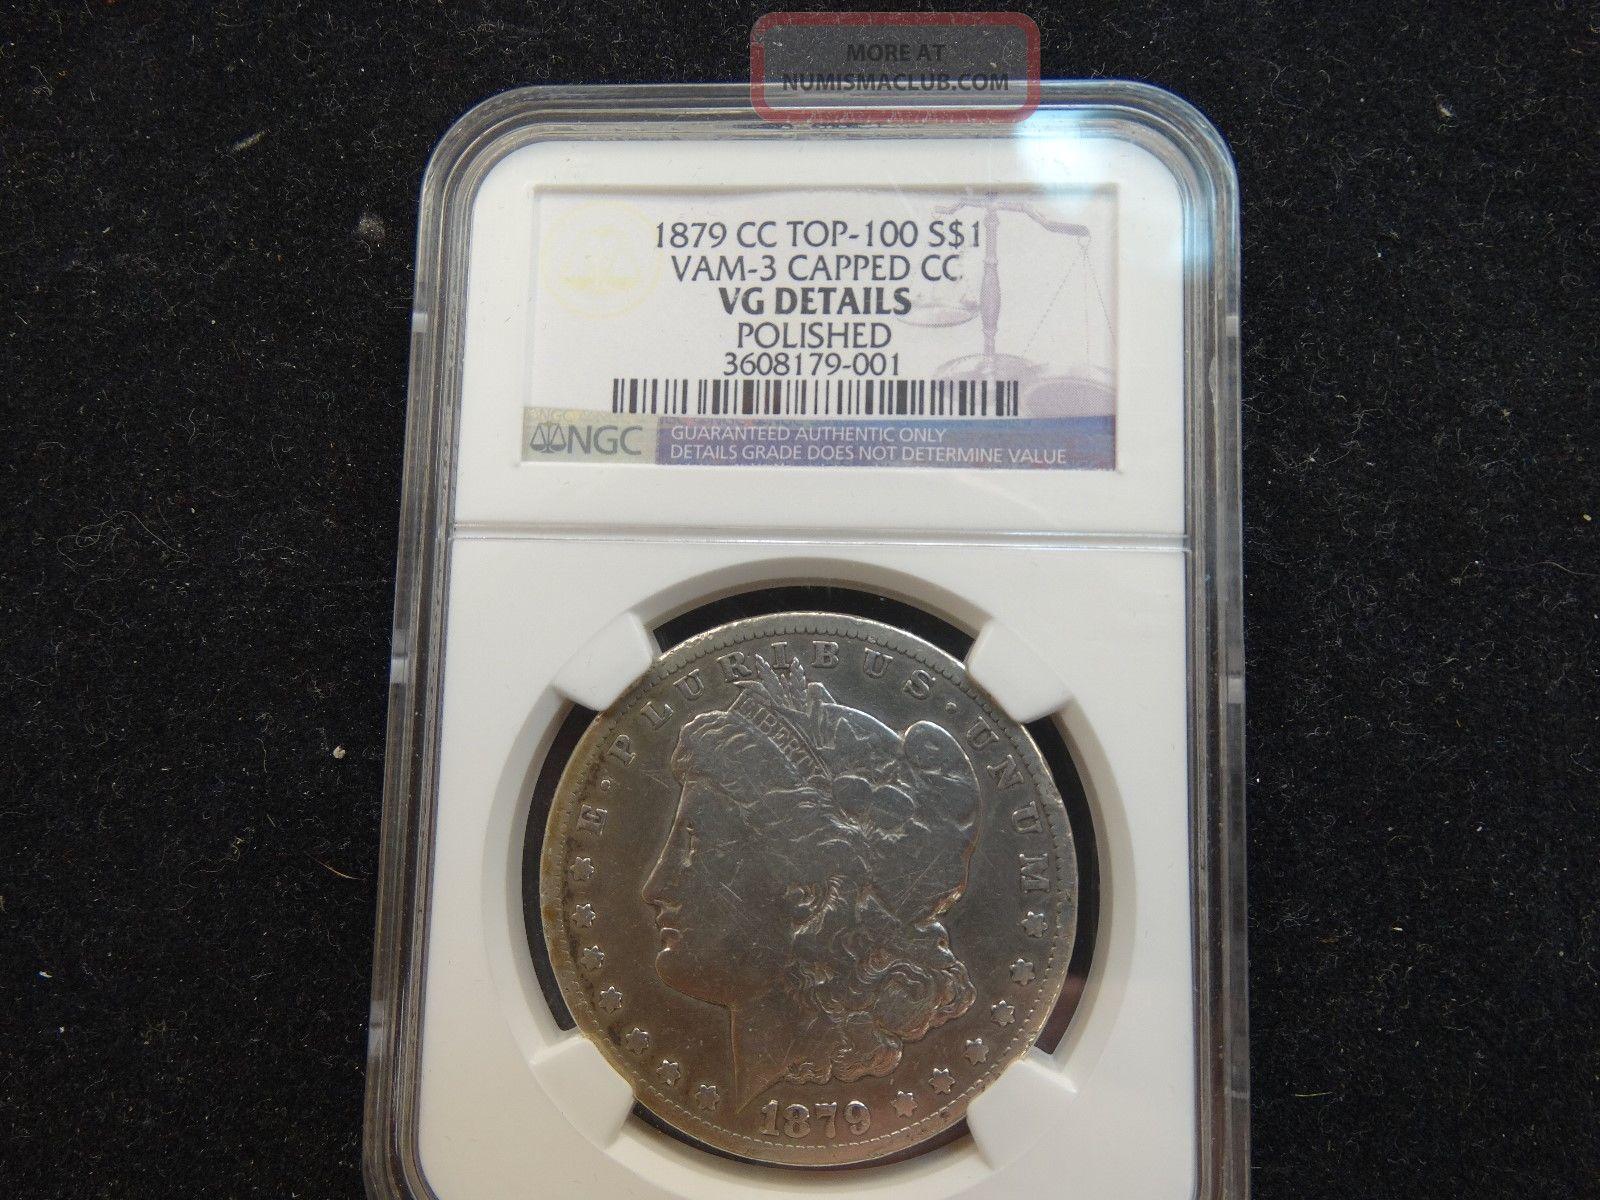 1879 Cc Morgan Silver Dollar Ngc Vam - 3 Capped Cc Top 100 Vg Details Polished Dollars photo